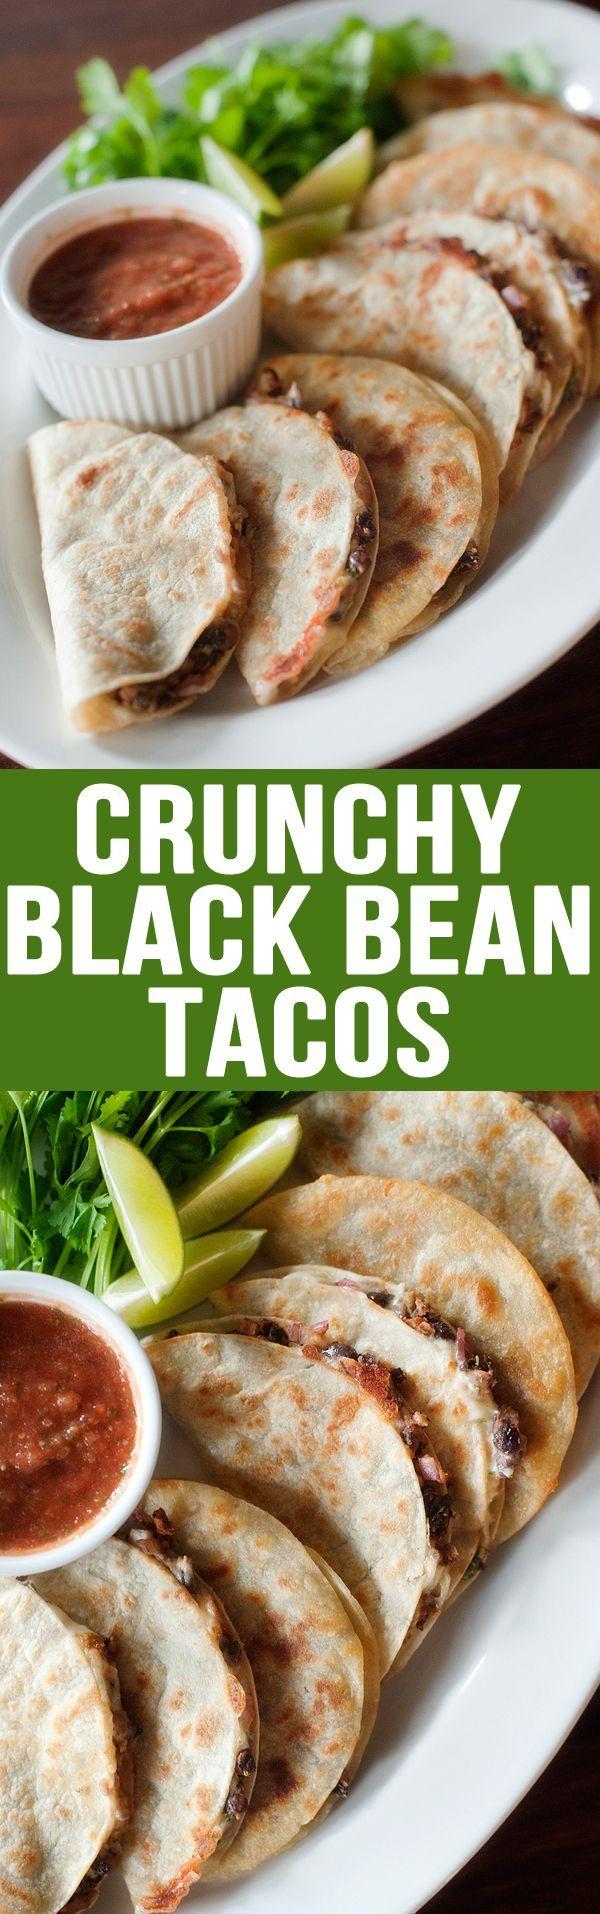 Becca thumbs up! Crunchy Black Bean Tacos